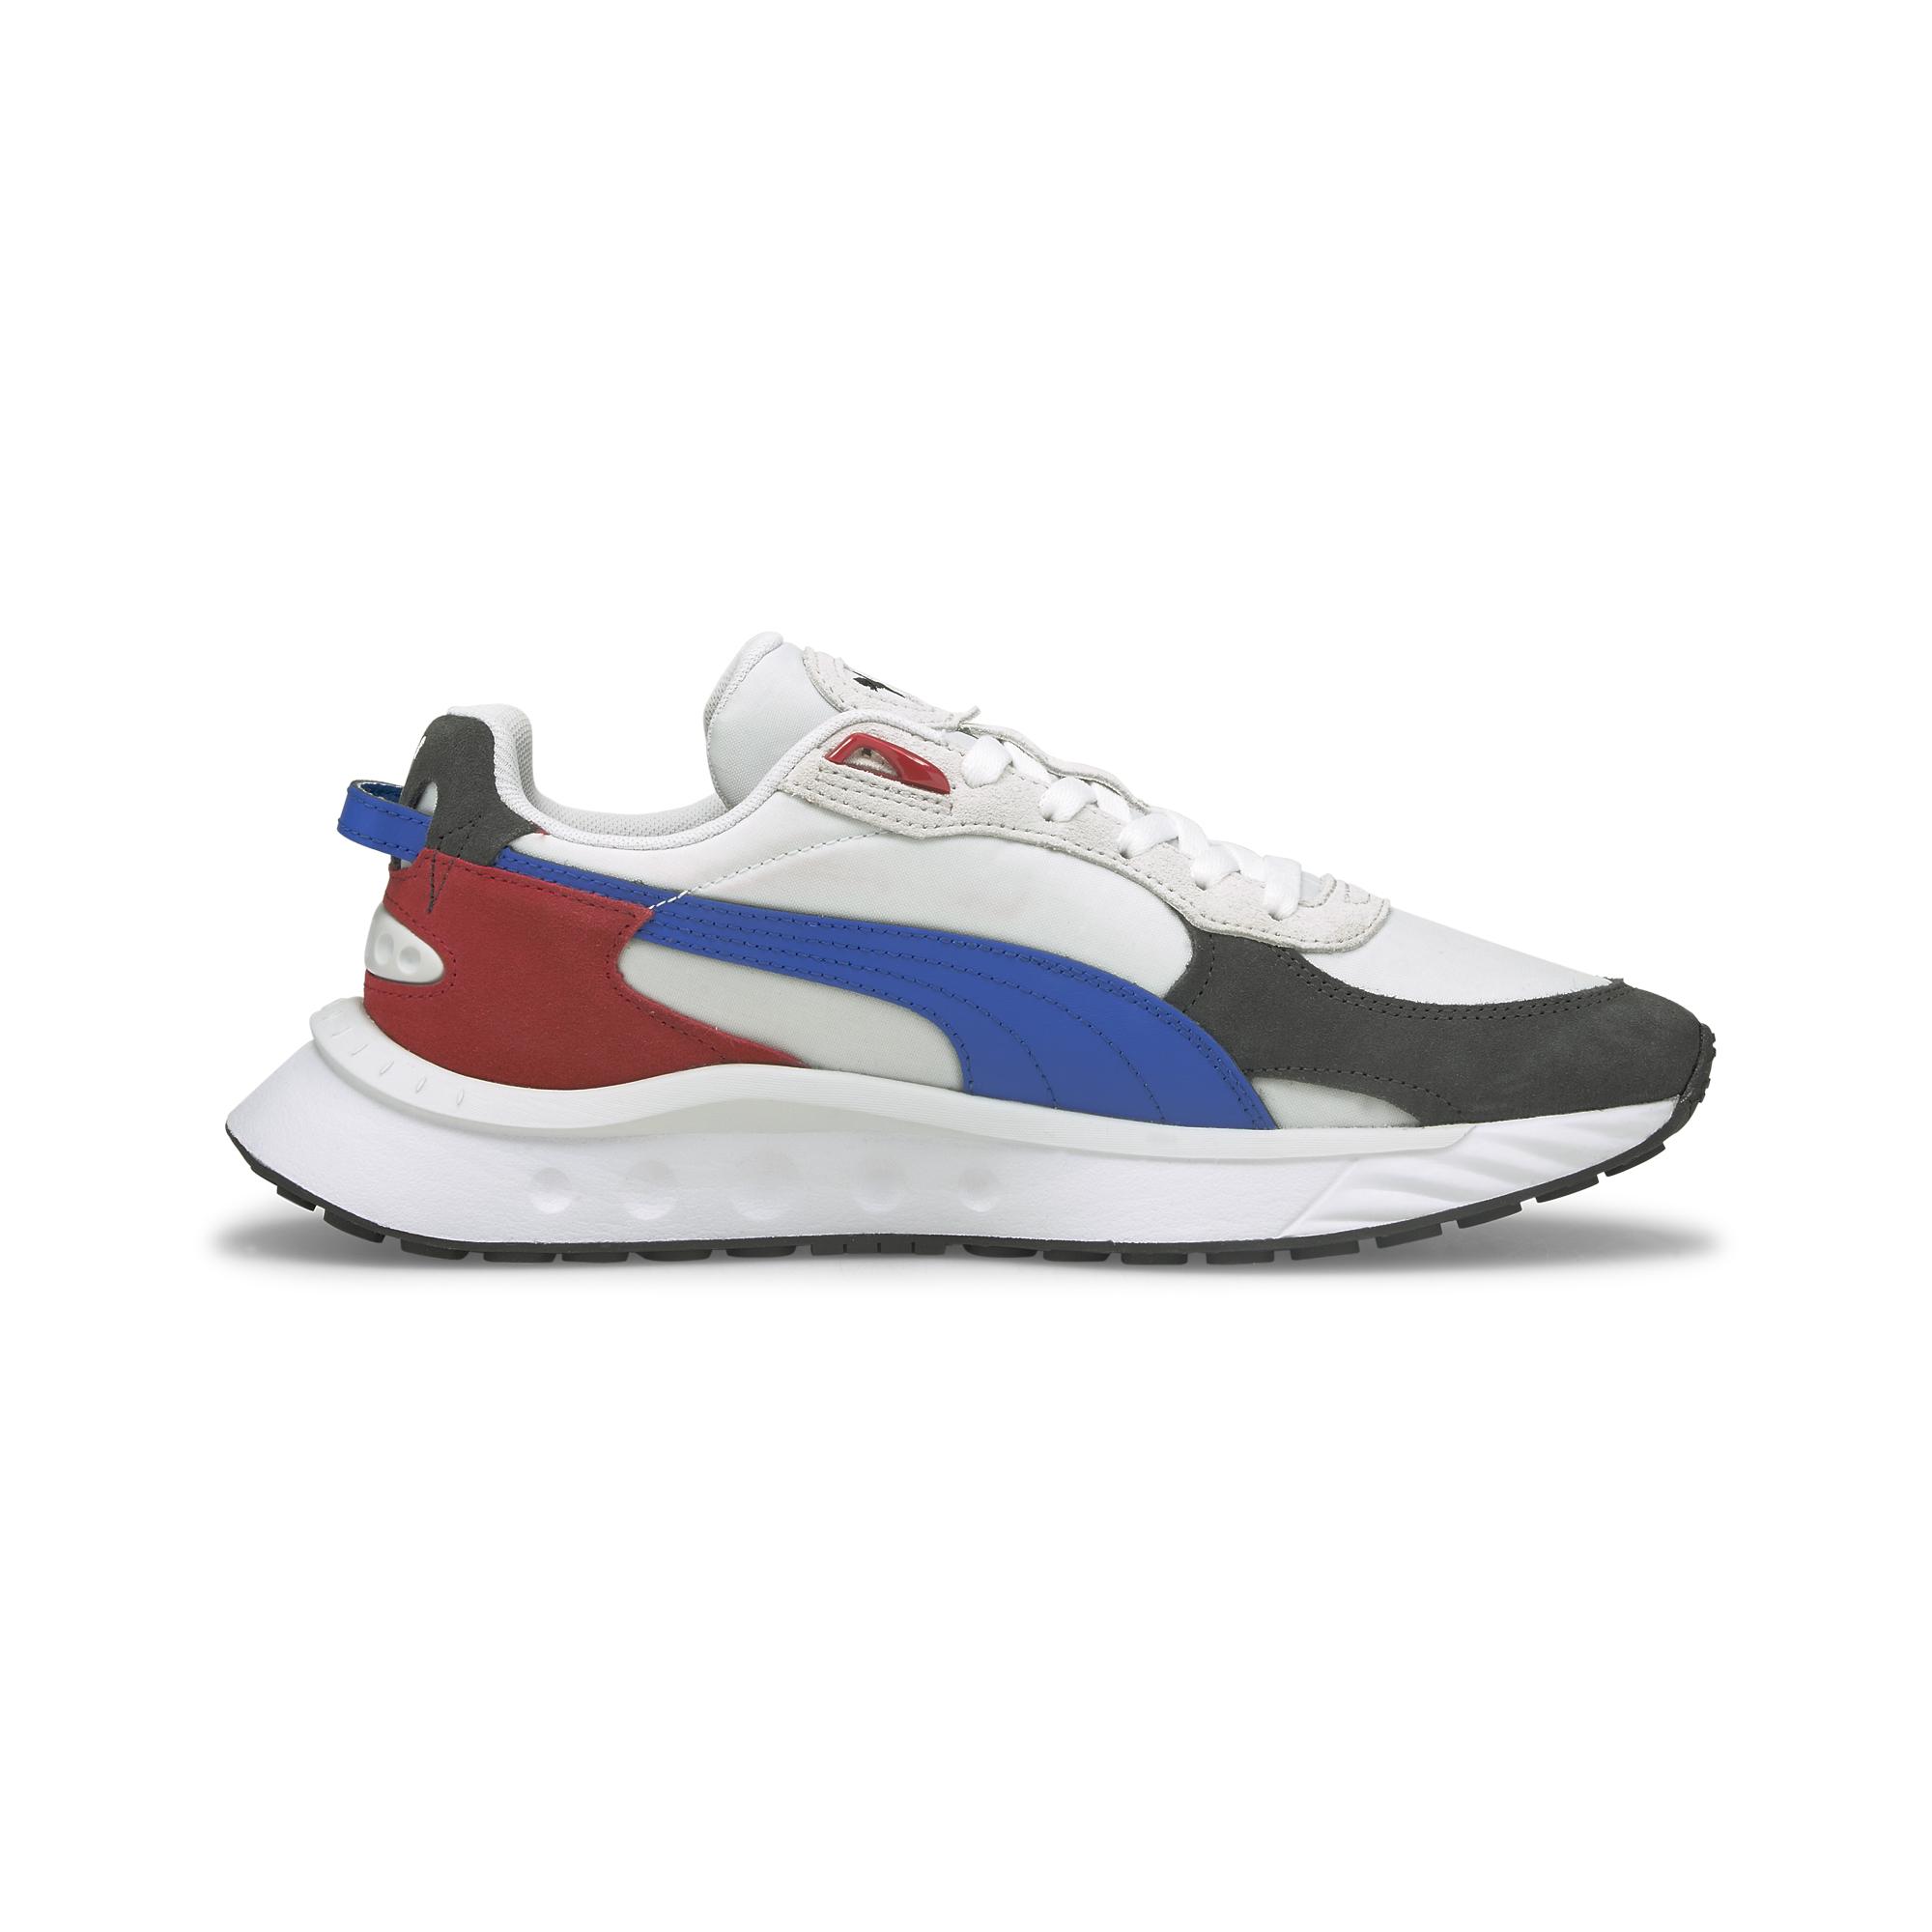 Puma Wild Rider Rollin' sneakers, ebony, 41